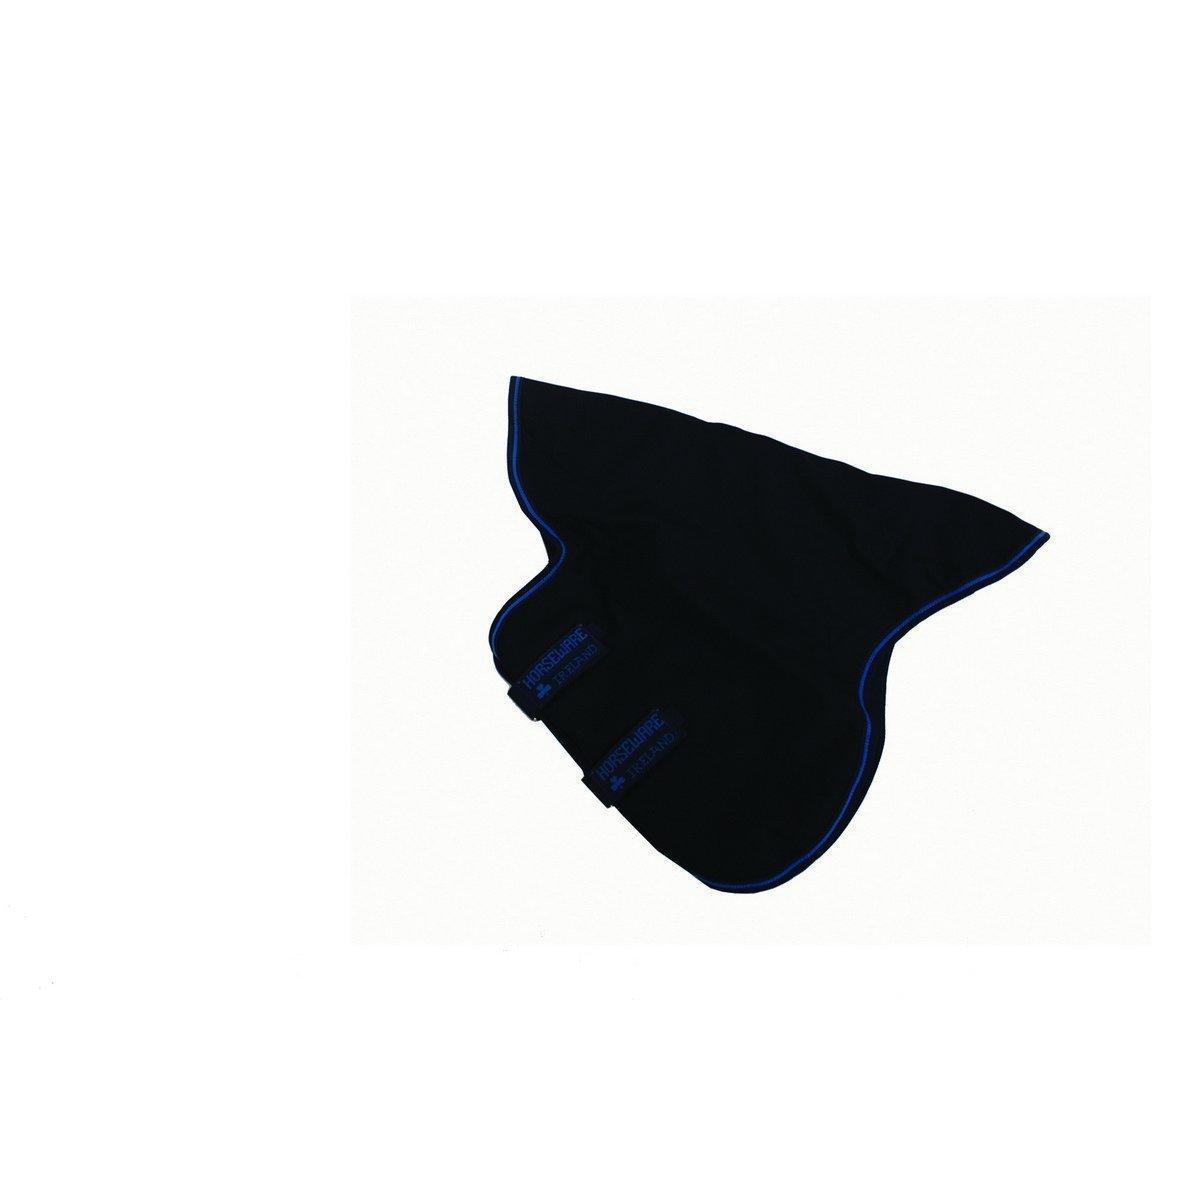 Afbeelding van Amigo 1200D Halsstuk 150gr Navy/Electric Blue Extra Large